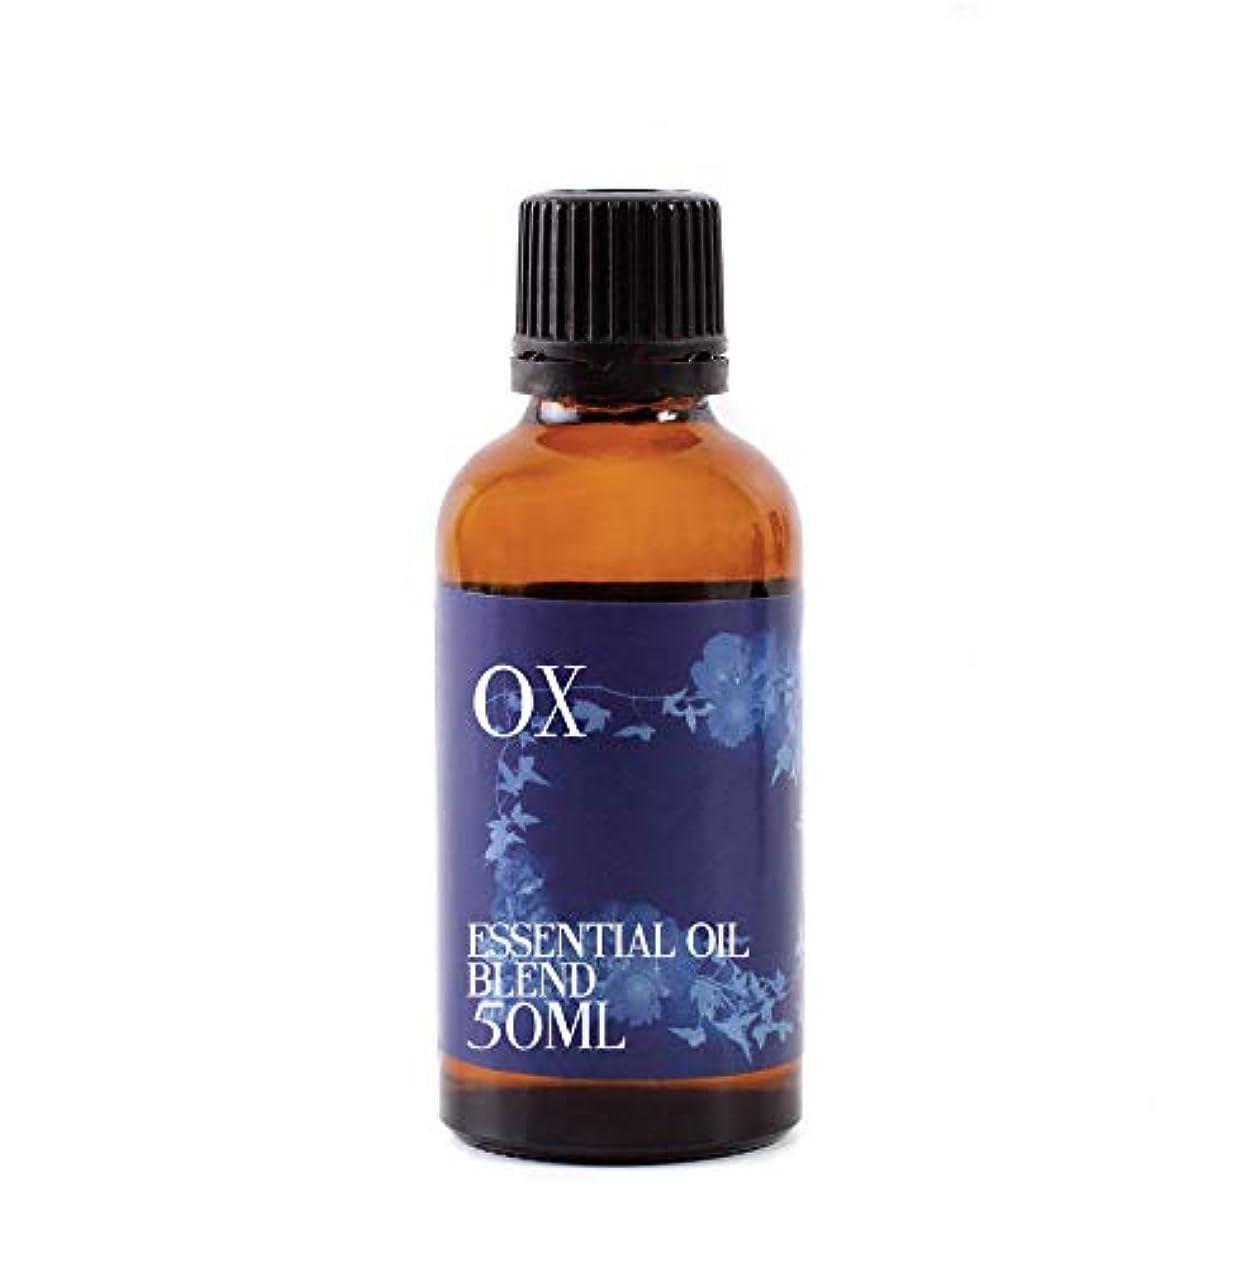 Mystix London | Ox | Chinese Zodiac Essential Oil Blend 50ml